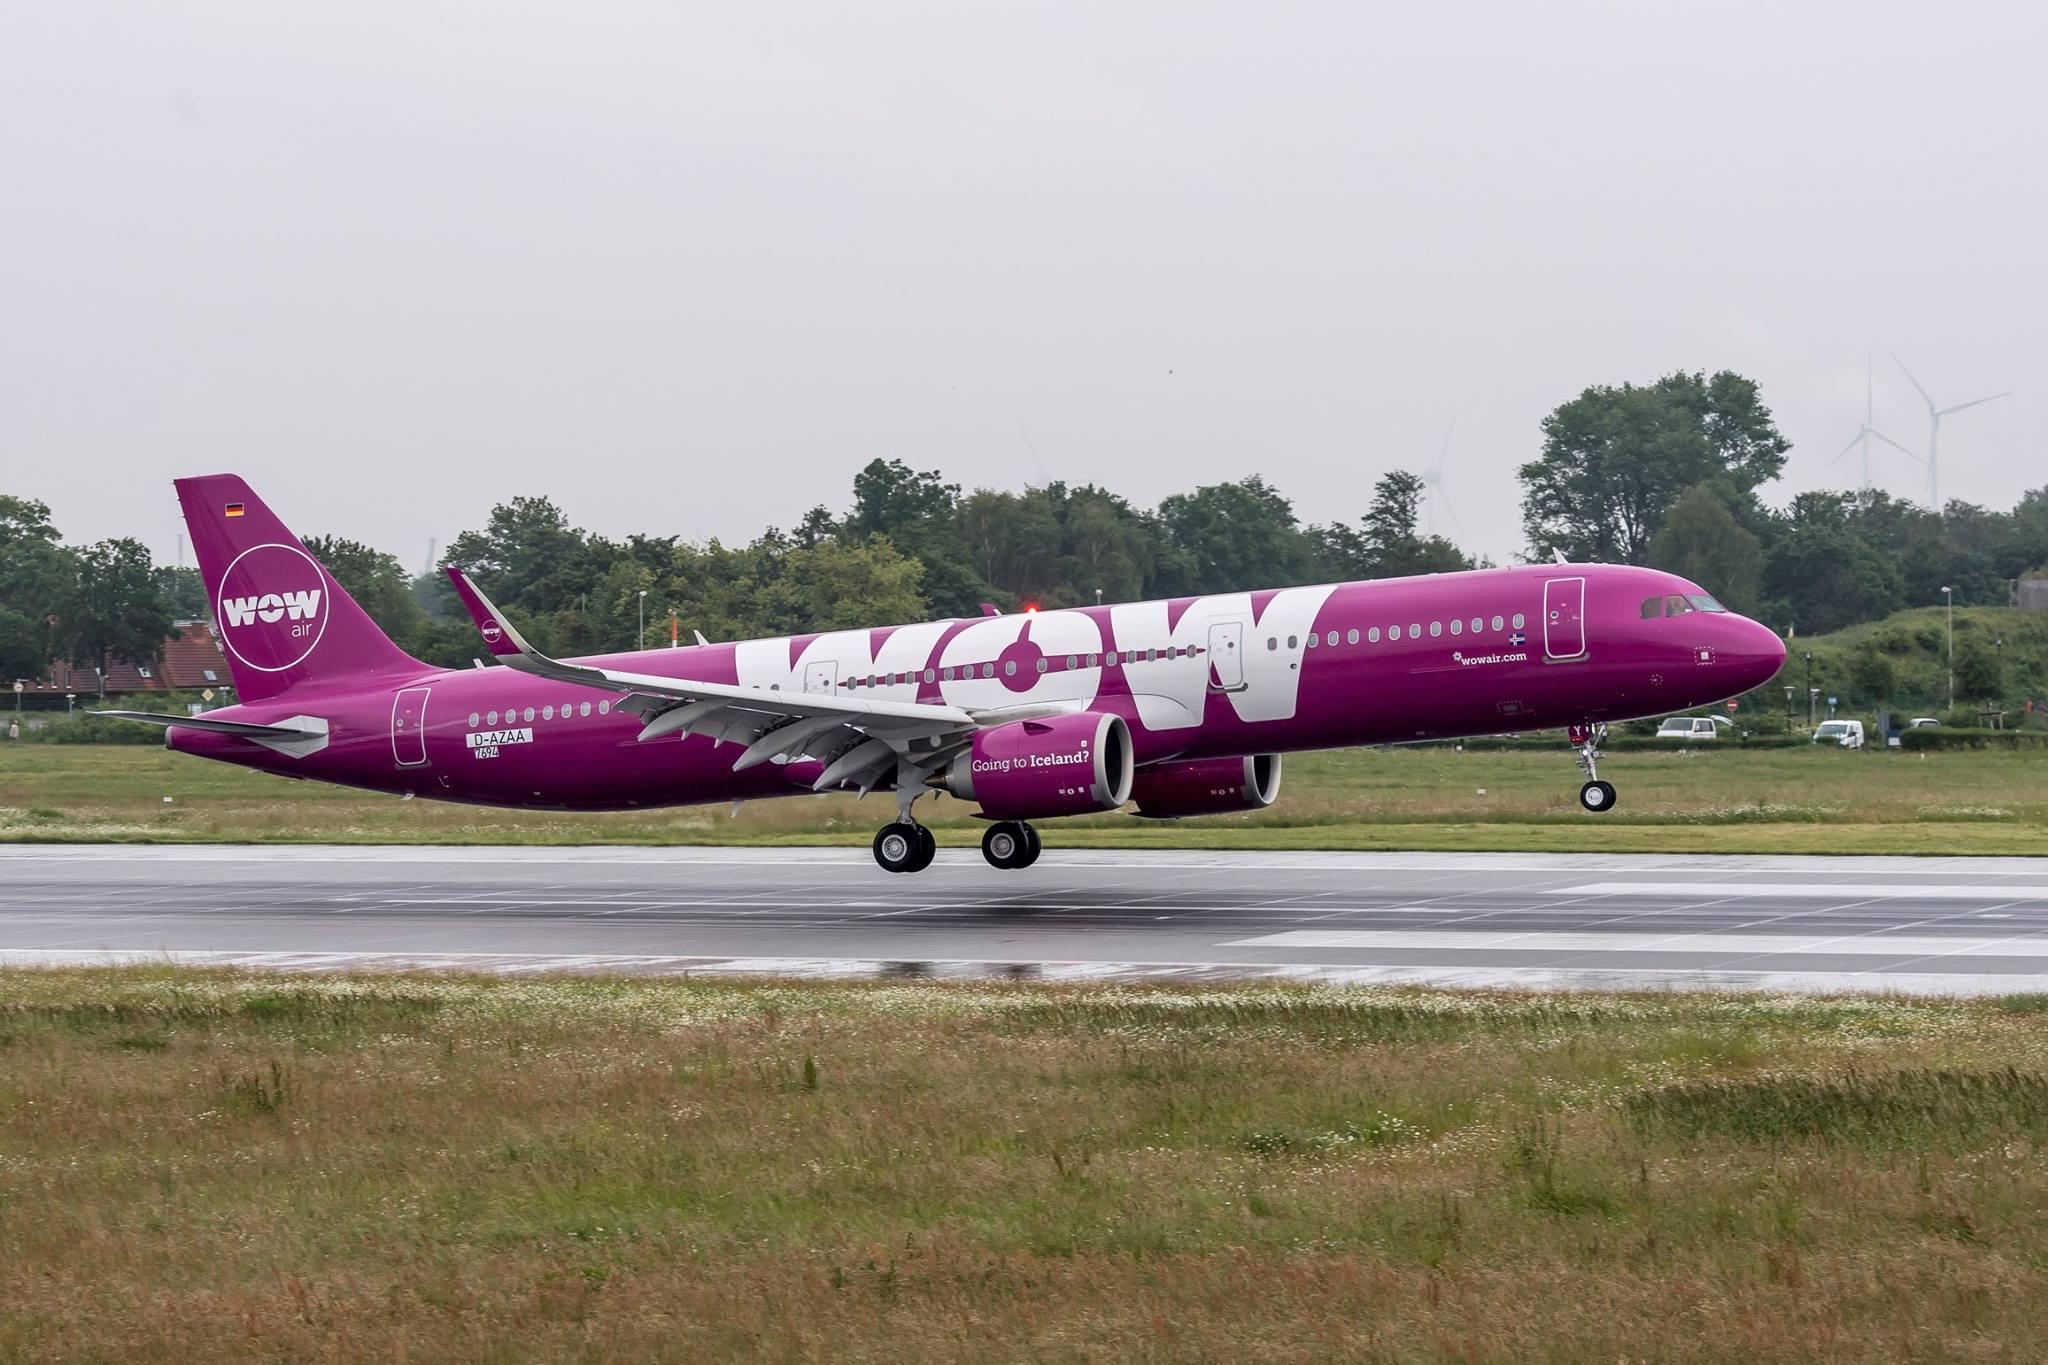 Annulation des vols WOW Air   Informations et conseils